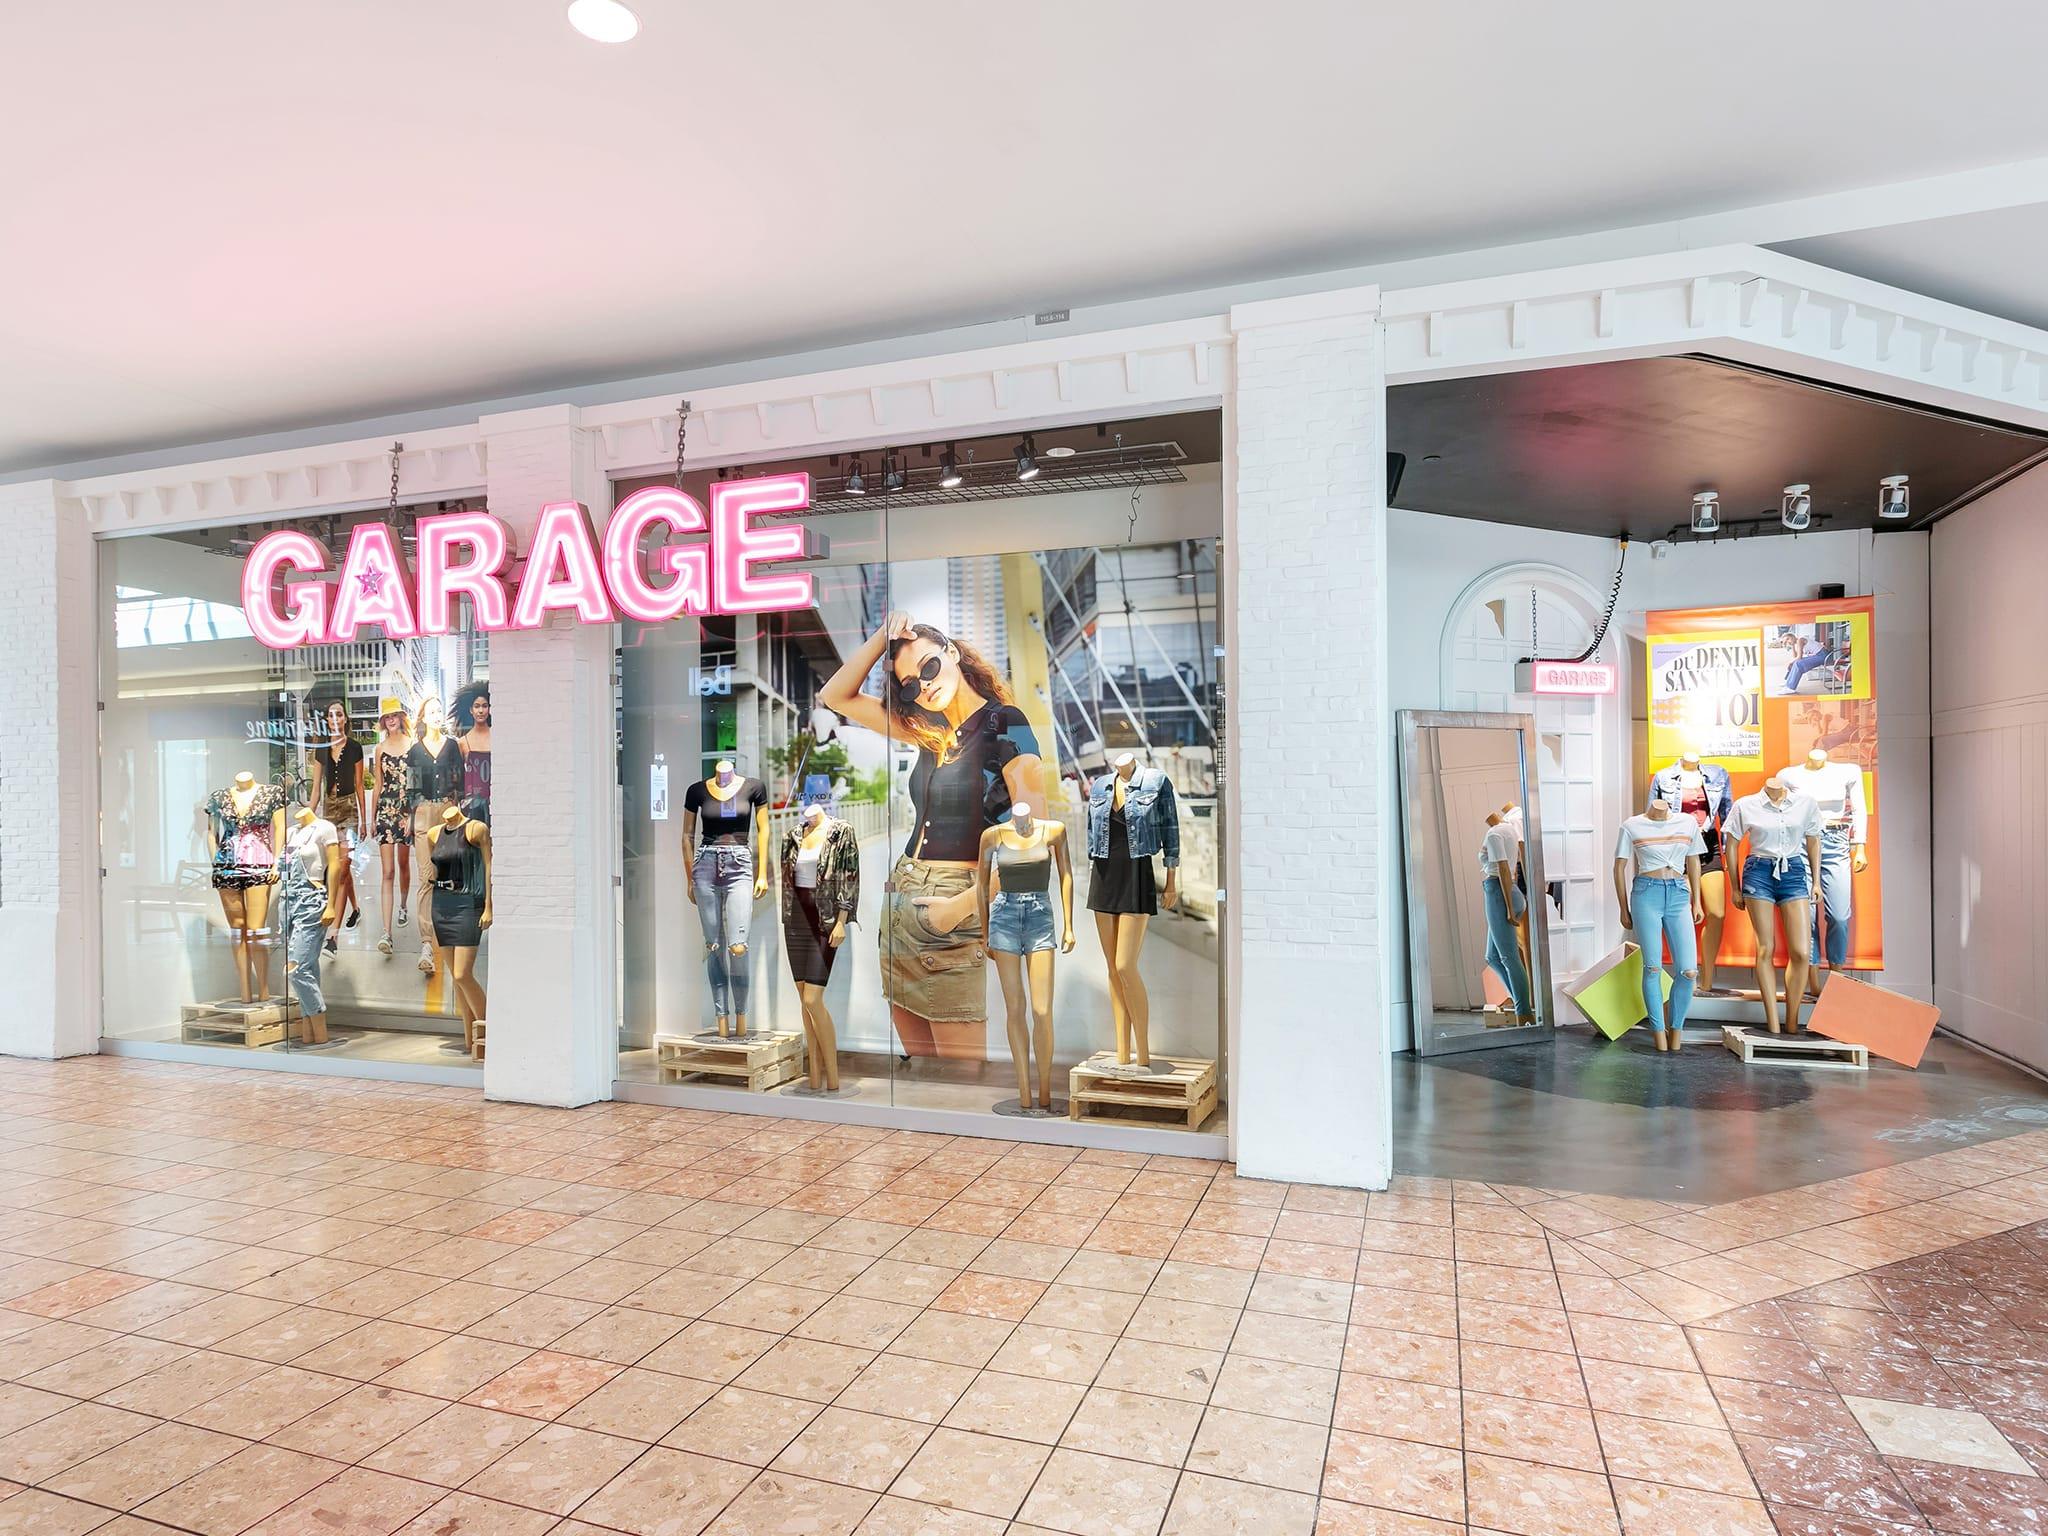 Garage - galeries - rive - nord